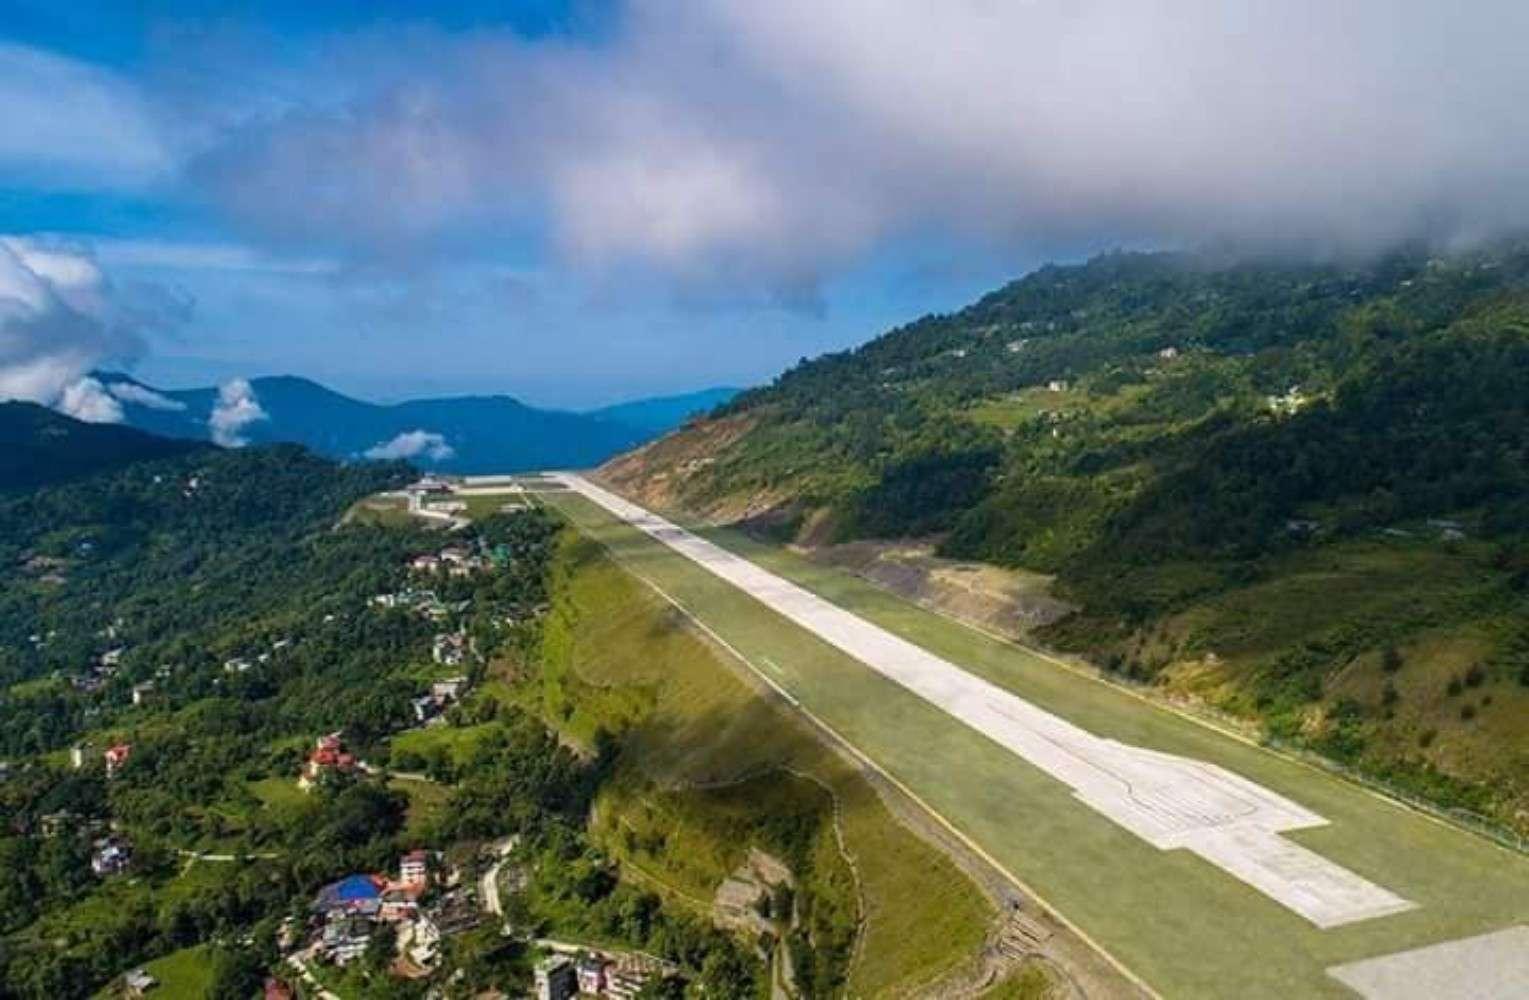 Pakyong Airport runway Sikkim India